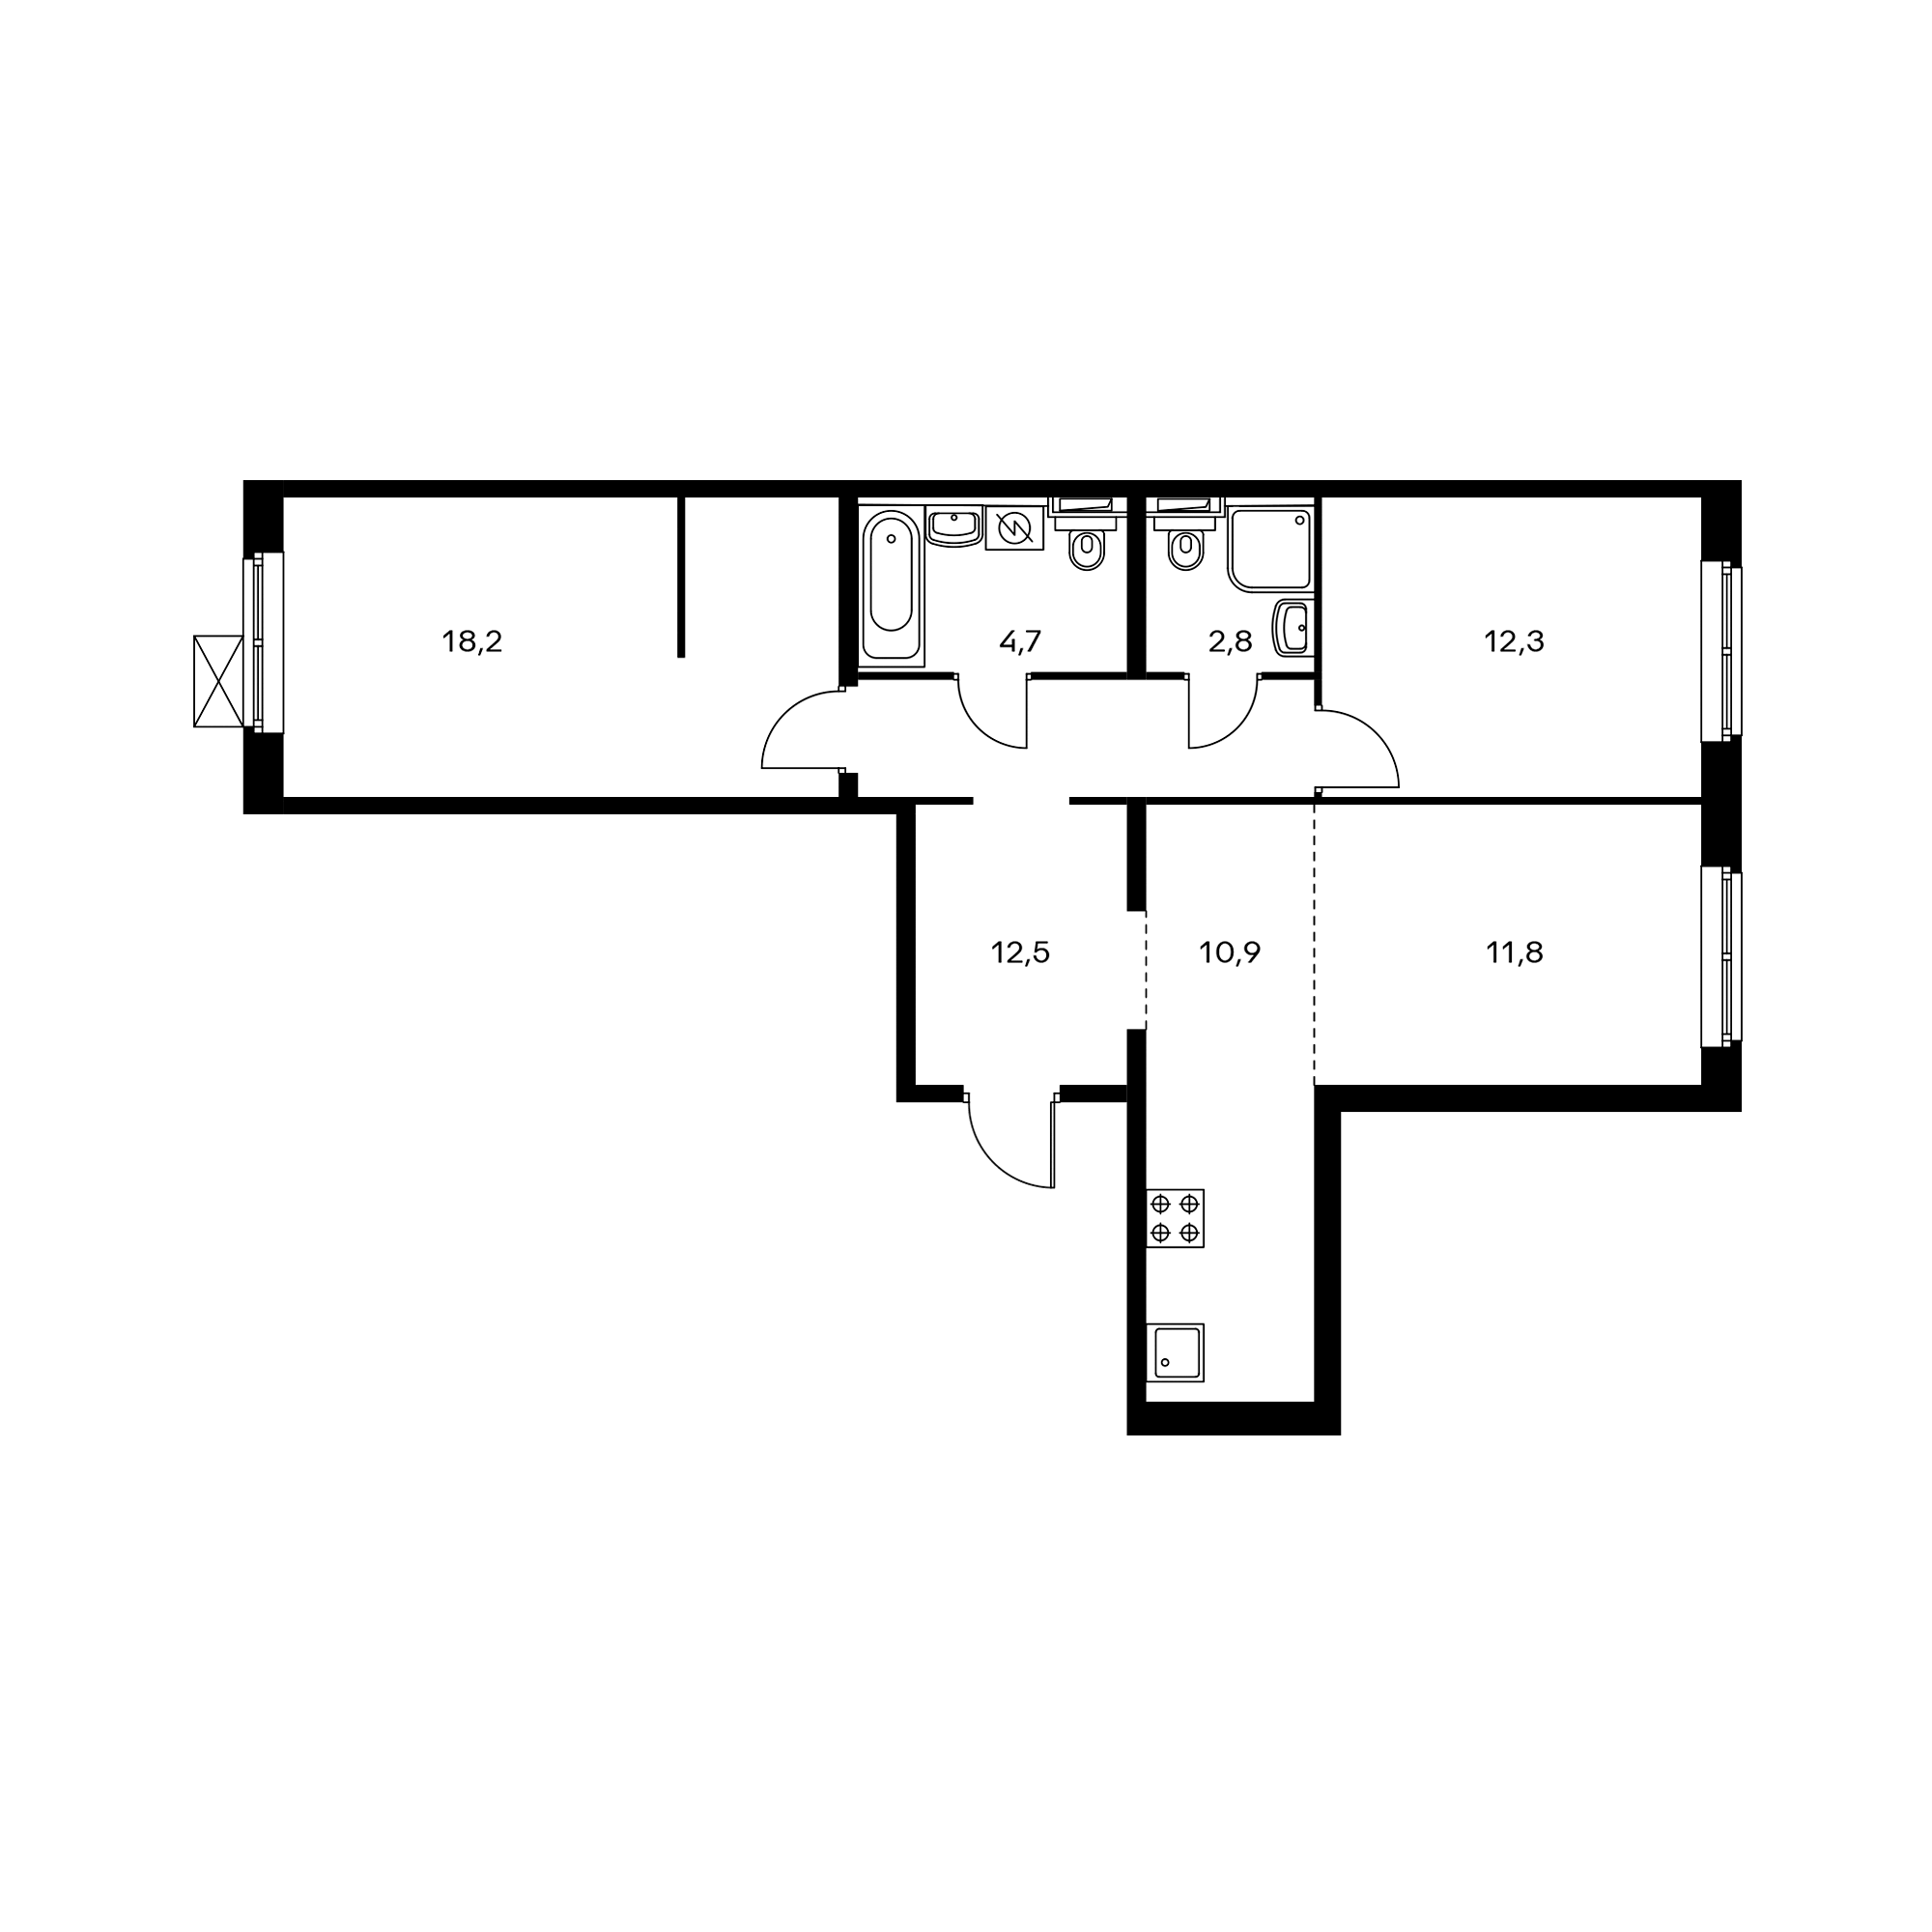 3NM3_9.6-1